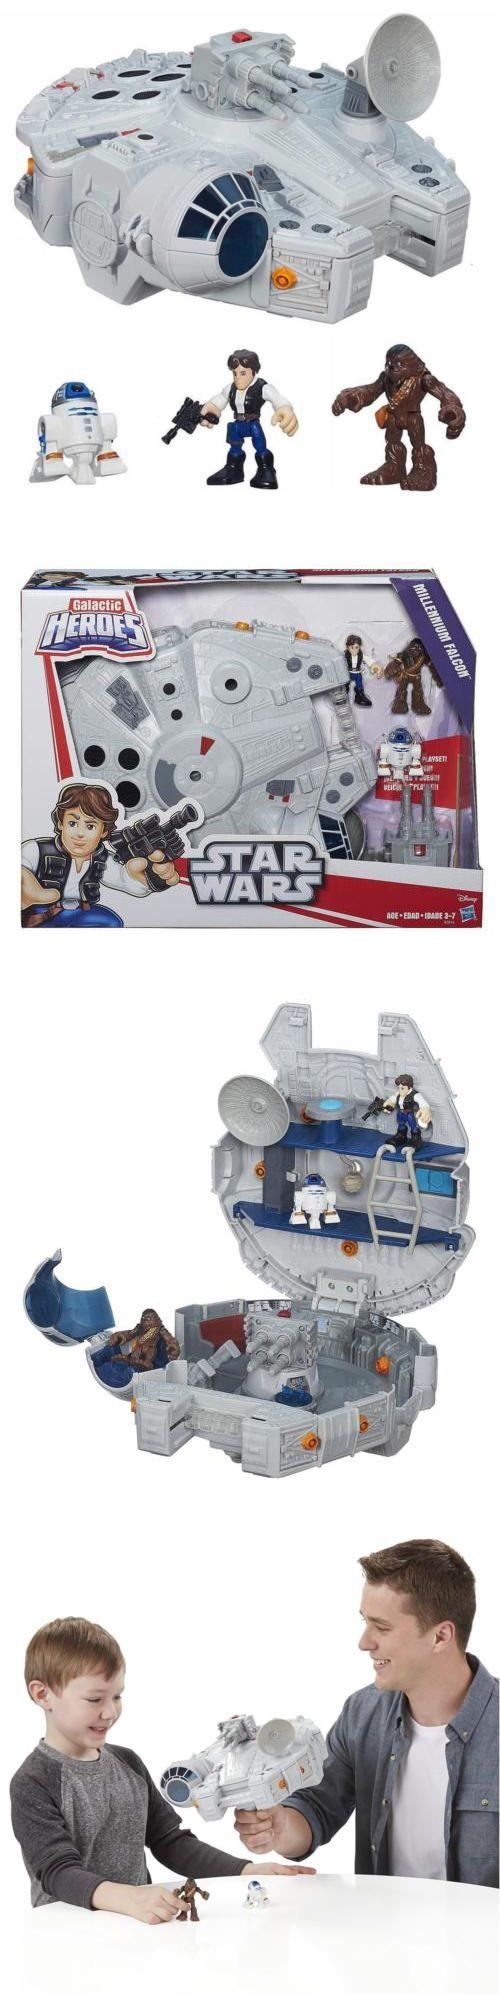 Playskool 2576: New Playskool Star Wars Galactic Heroes Millennium Falcon And Figures Cannon Kidz -> BUY IT NOW ONLY: $52.98 on eBay!